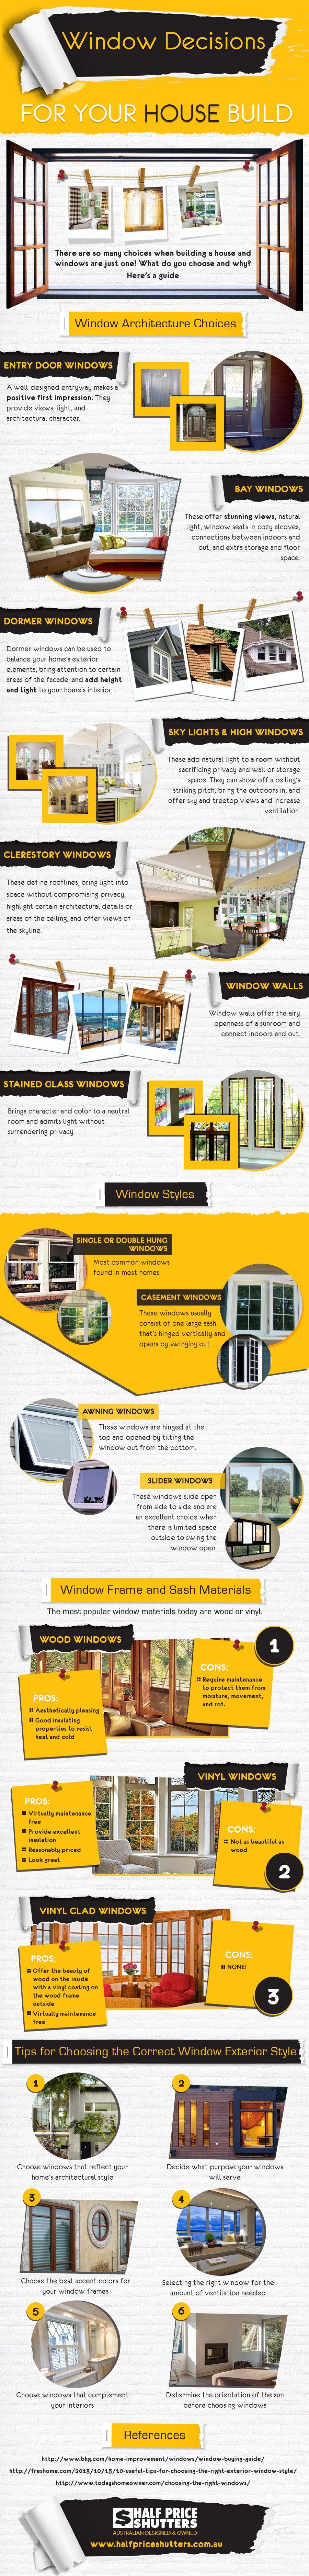 window-decisions-infographic